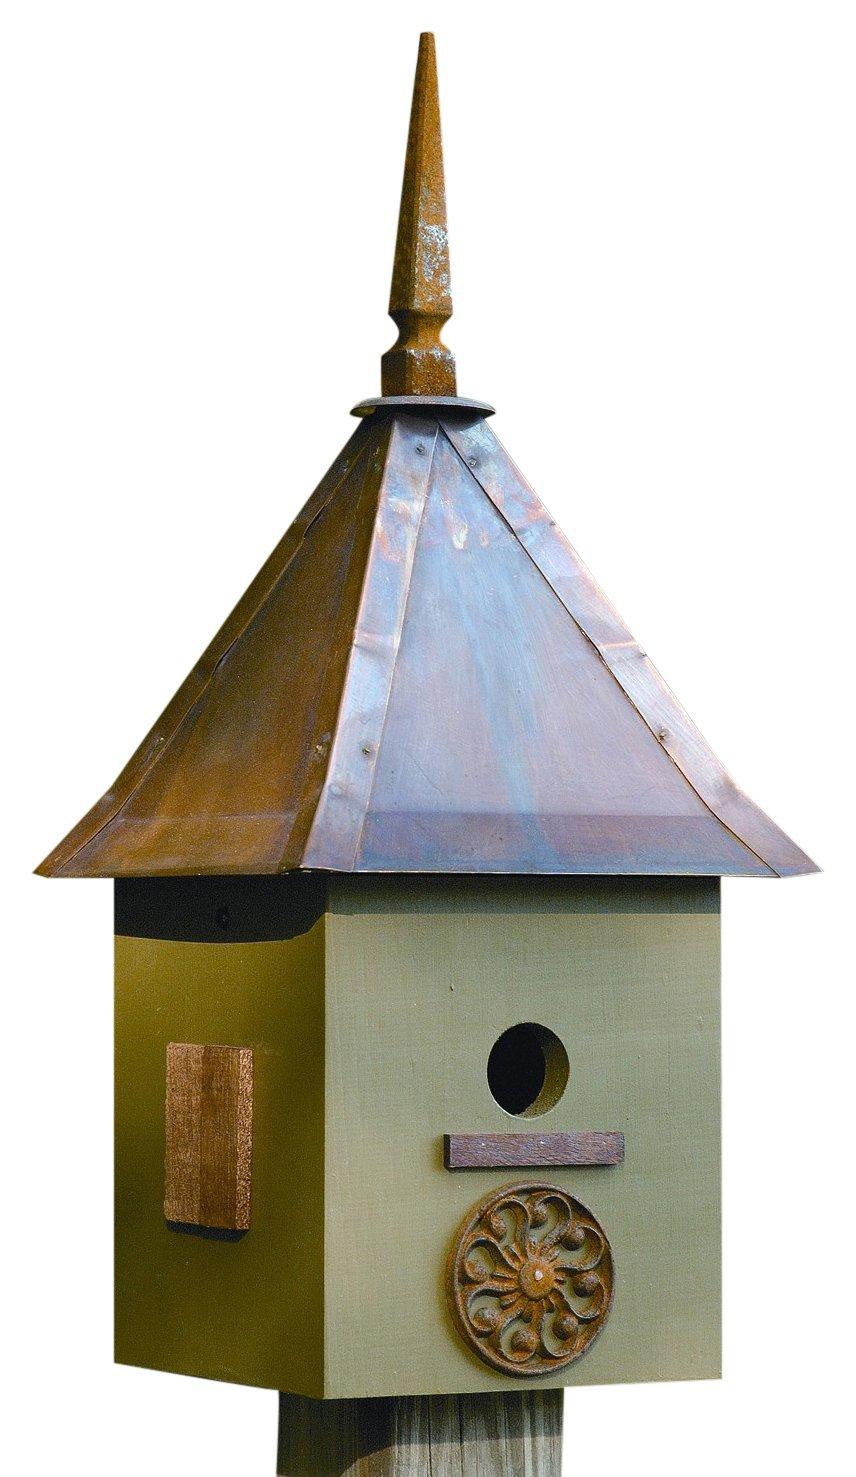 Heartwood 078B Songbird Suite Bird House Decorative